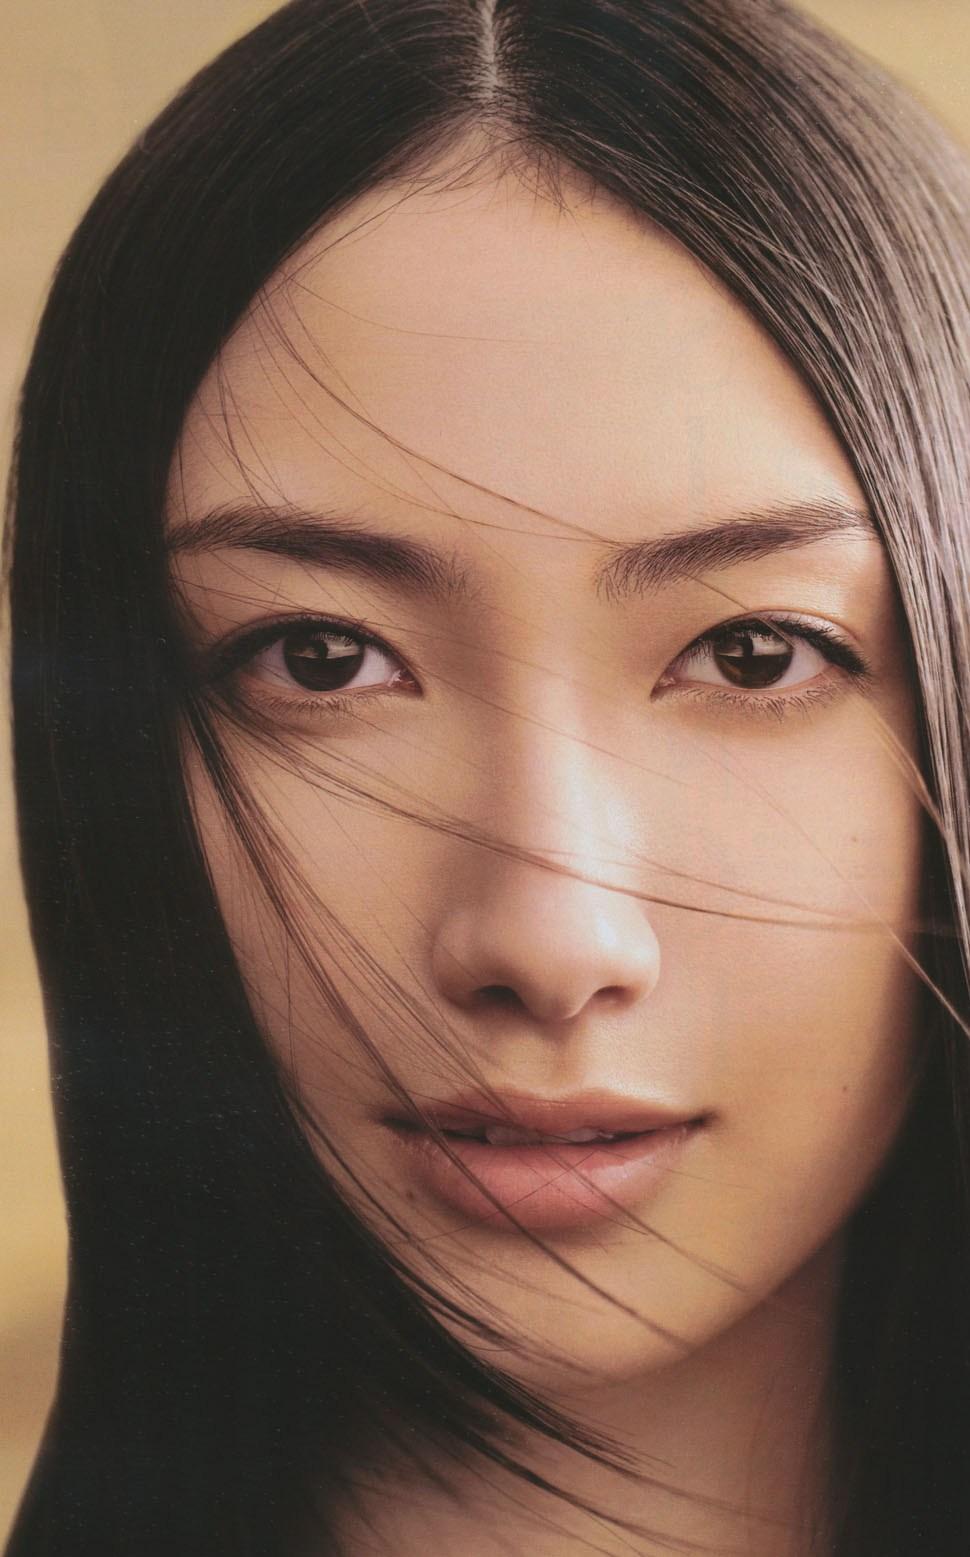 Yu Kashii Yu Kashii new images